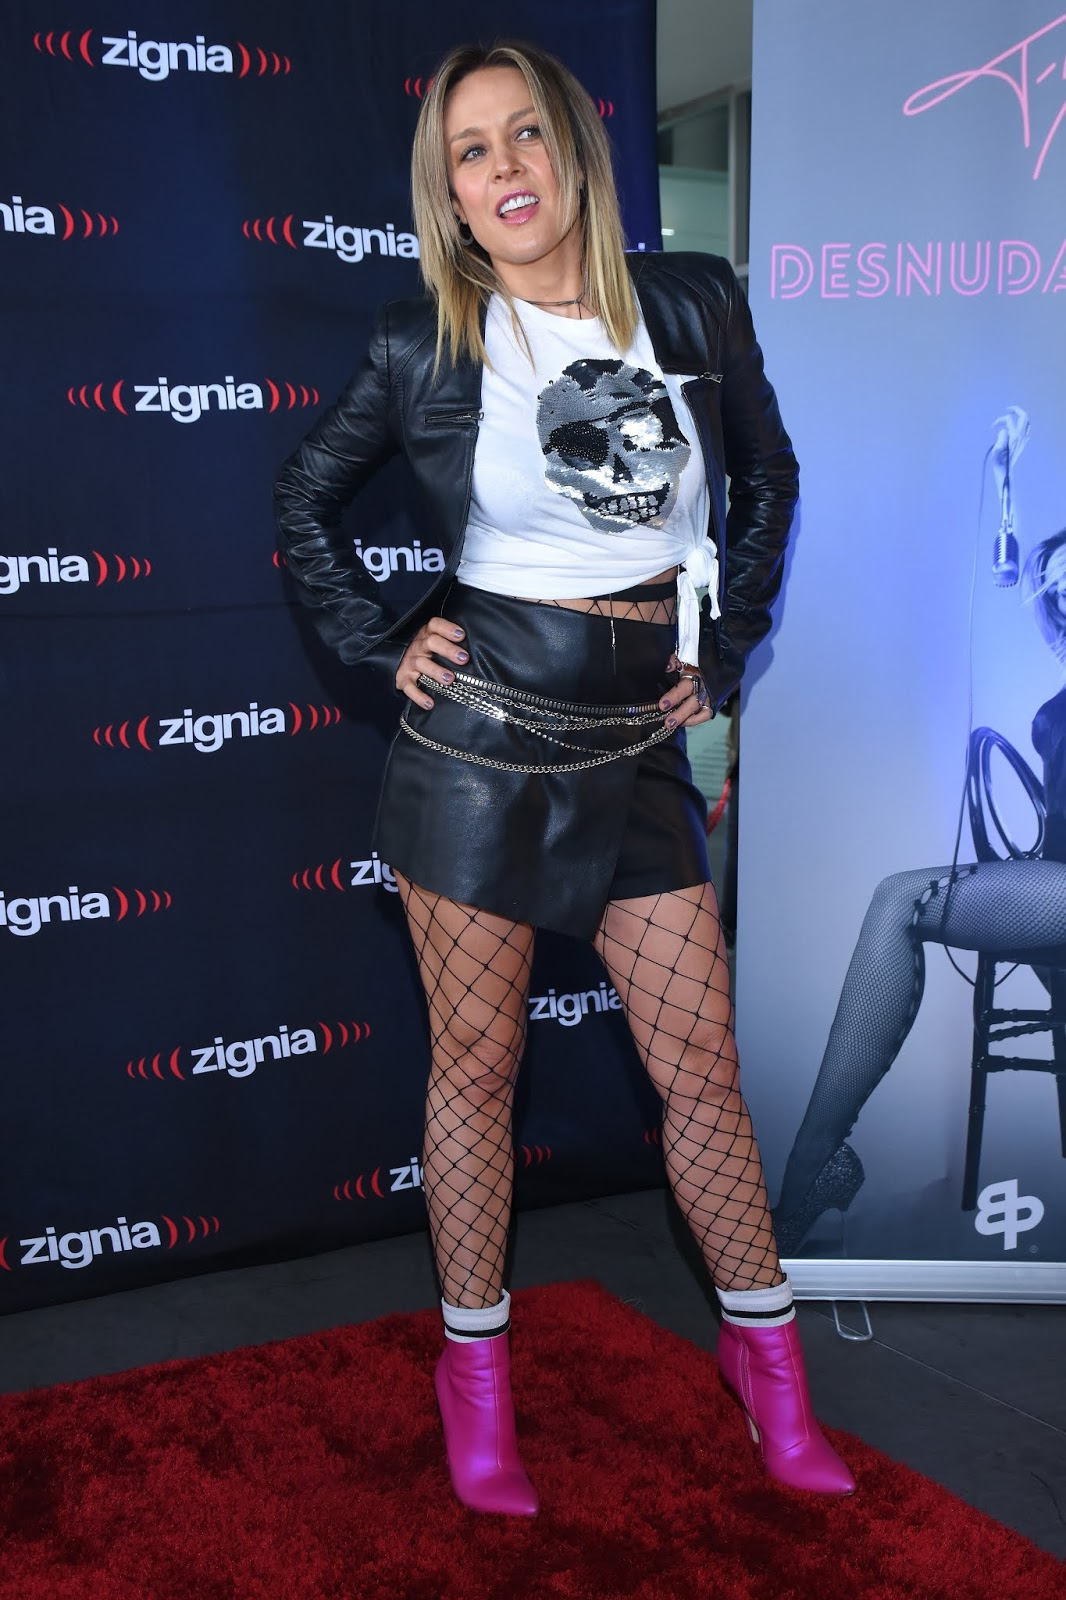 Ana Patricia Gamez Desnuda maria fernanda blazquez gil 'fey' attends a press conference